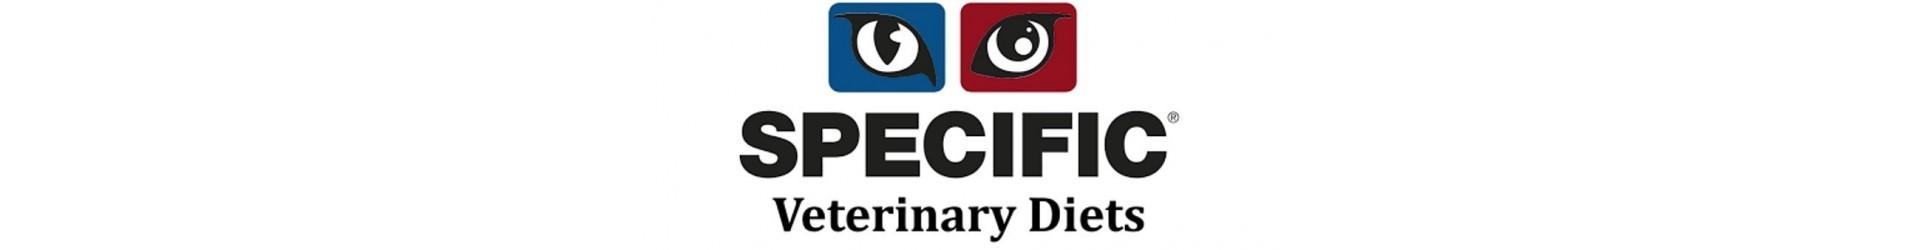 Specific Veterinary Diets